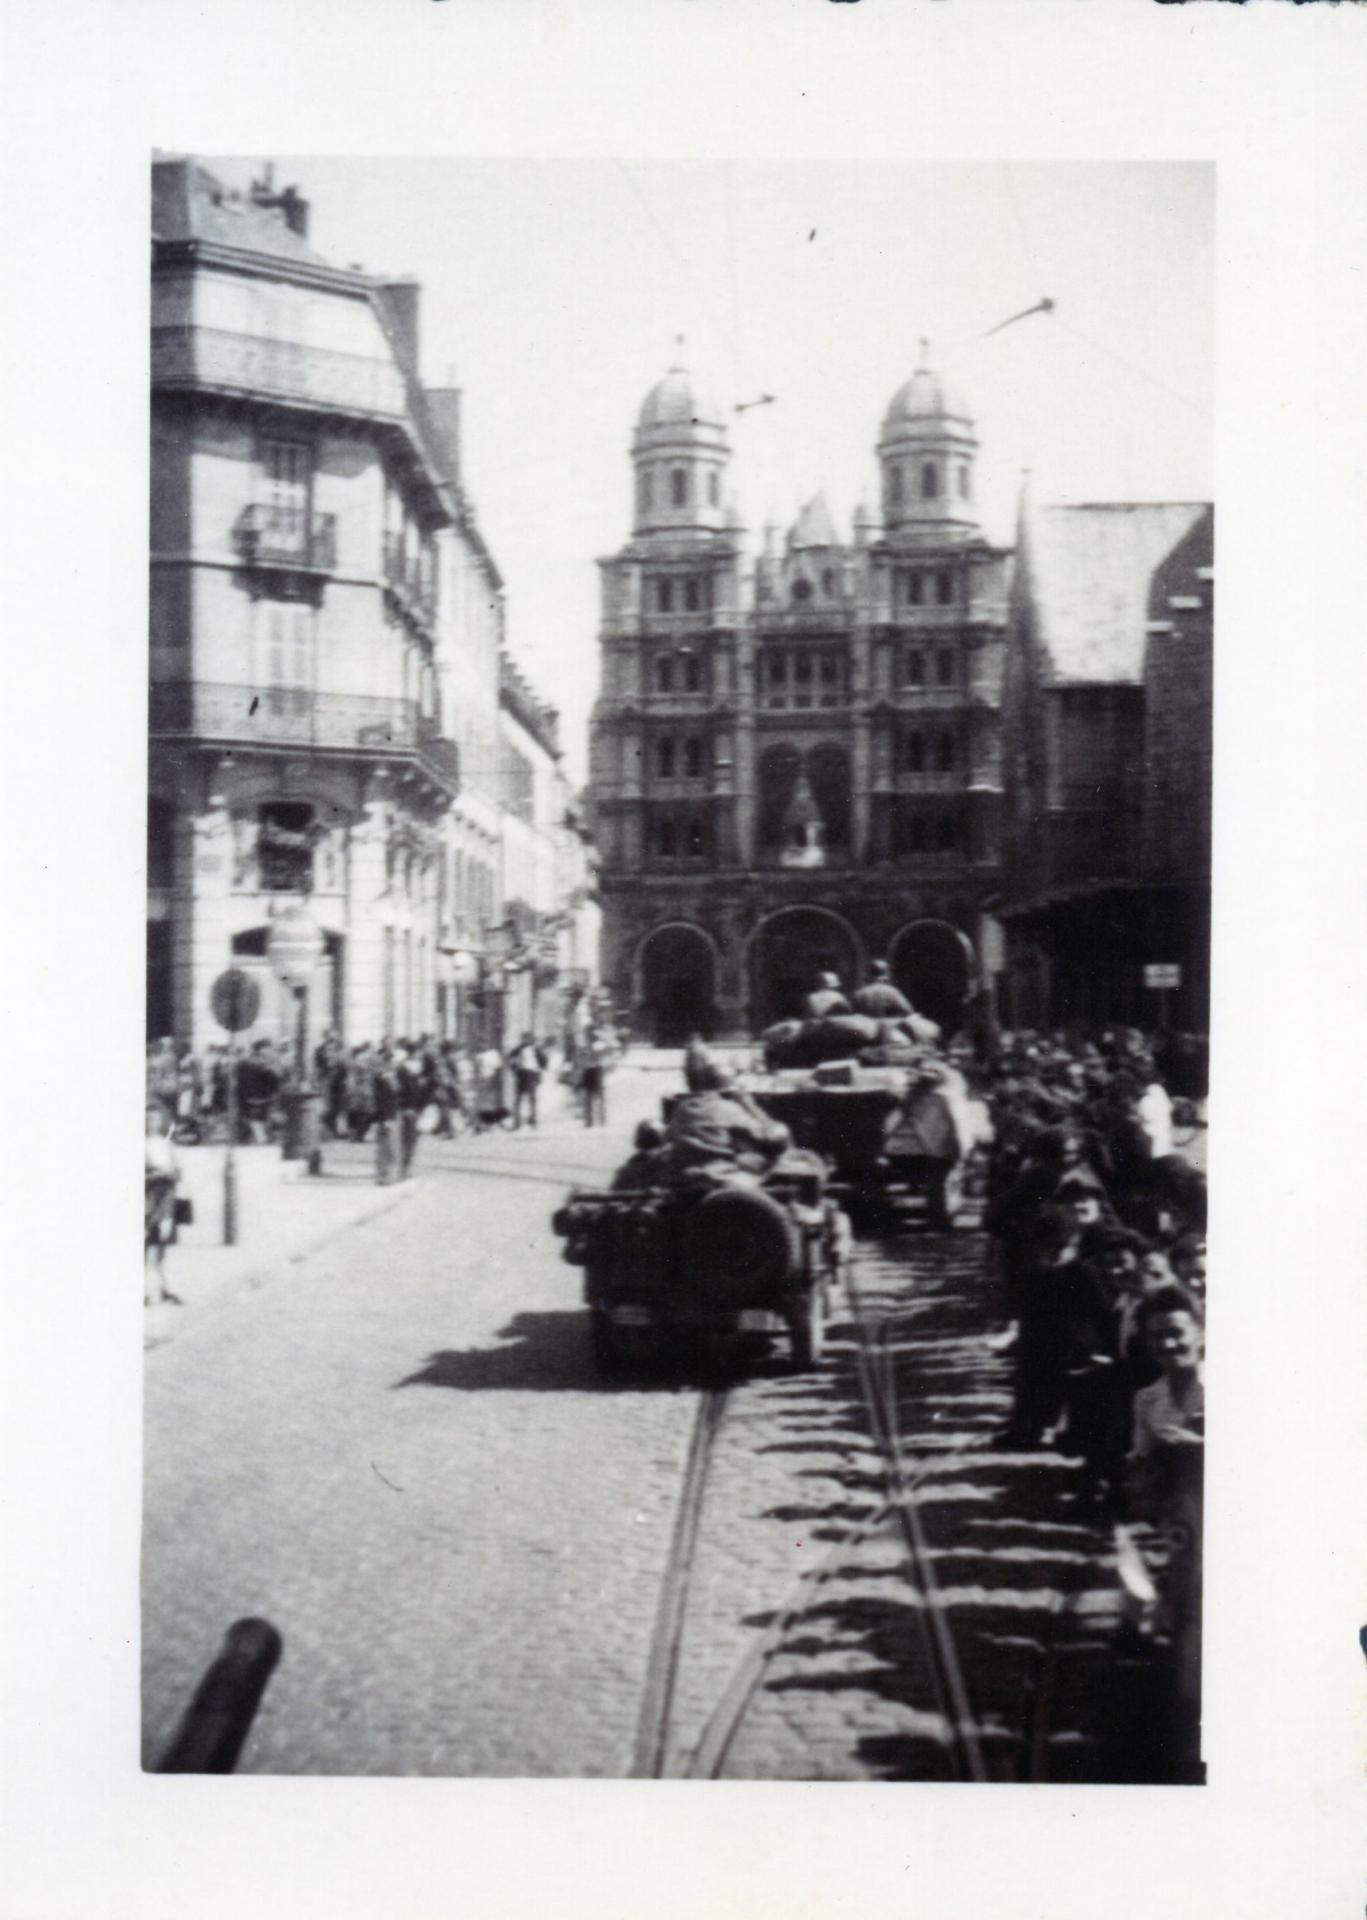 1944 09 13 entree dans dijon13 septembre 1944